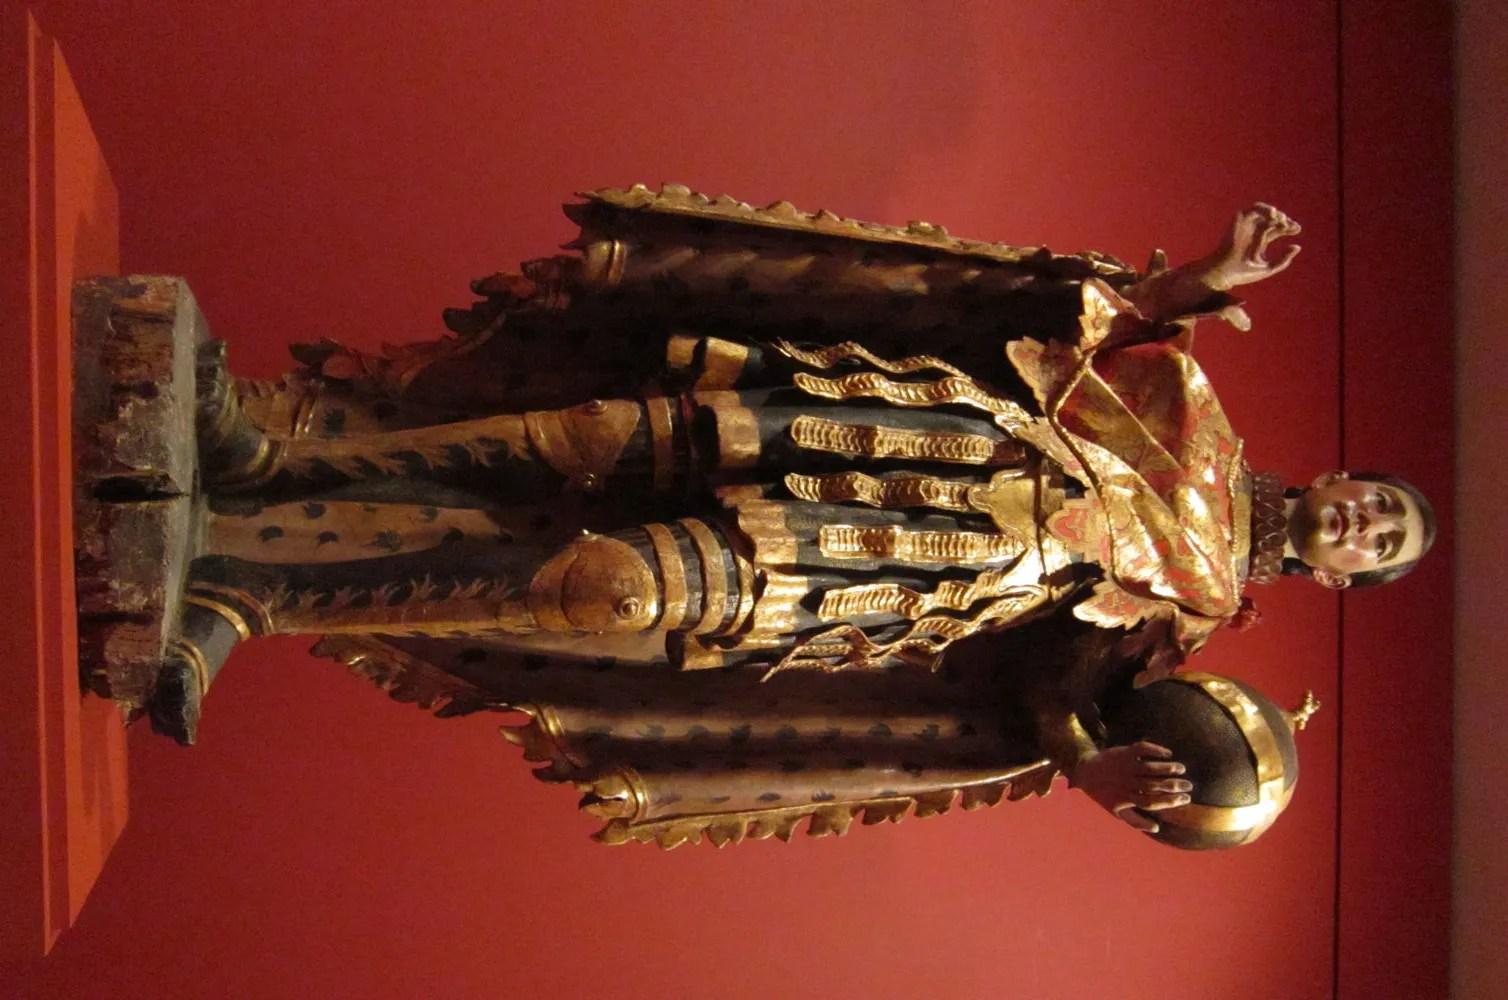 Spanish saint sculpture, Denver Art Museum